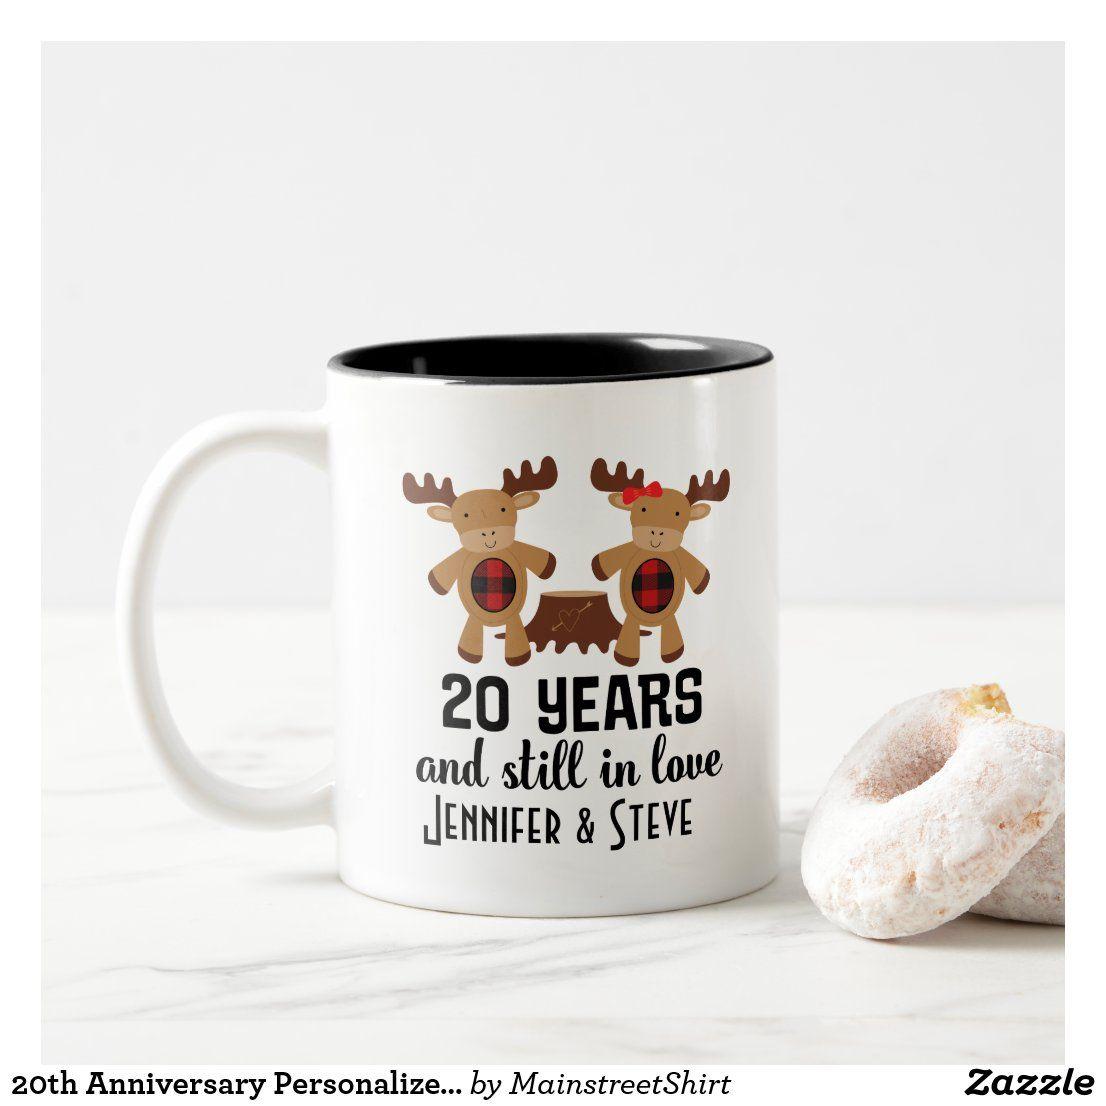 20th Anniversary Personalized Couples Mug Gift Zazzle